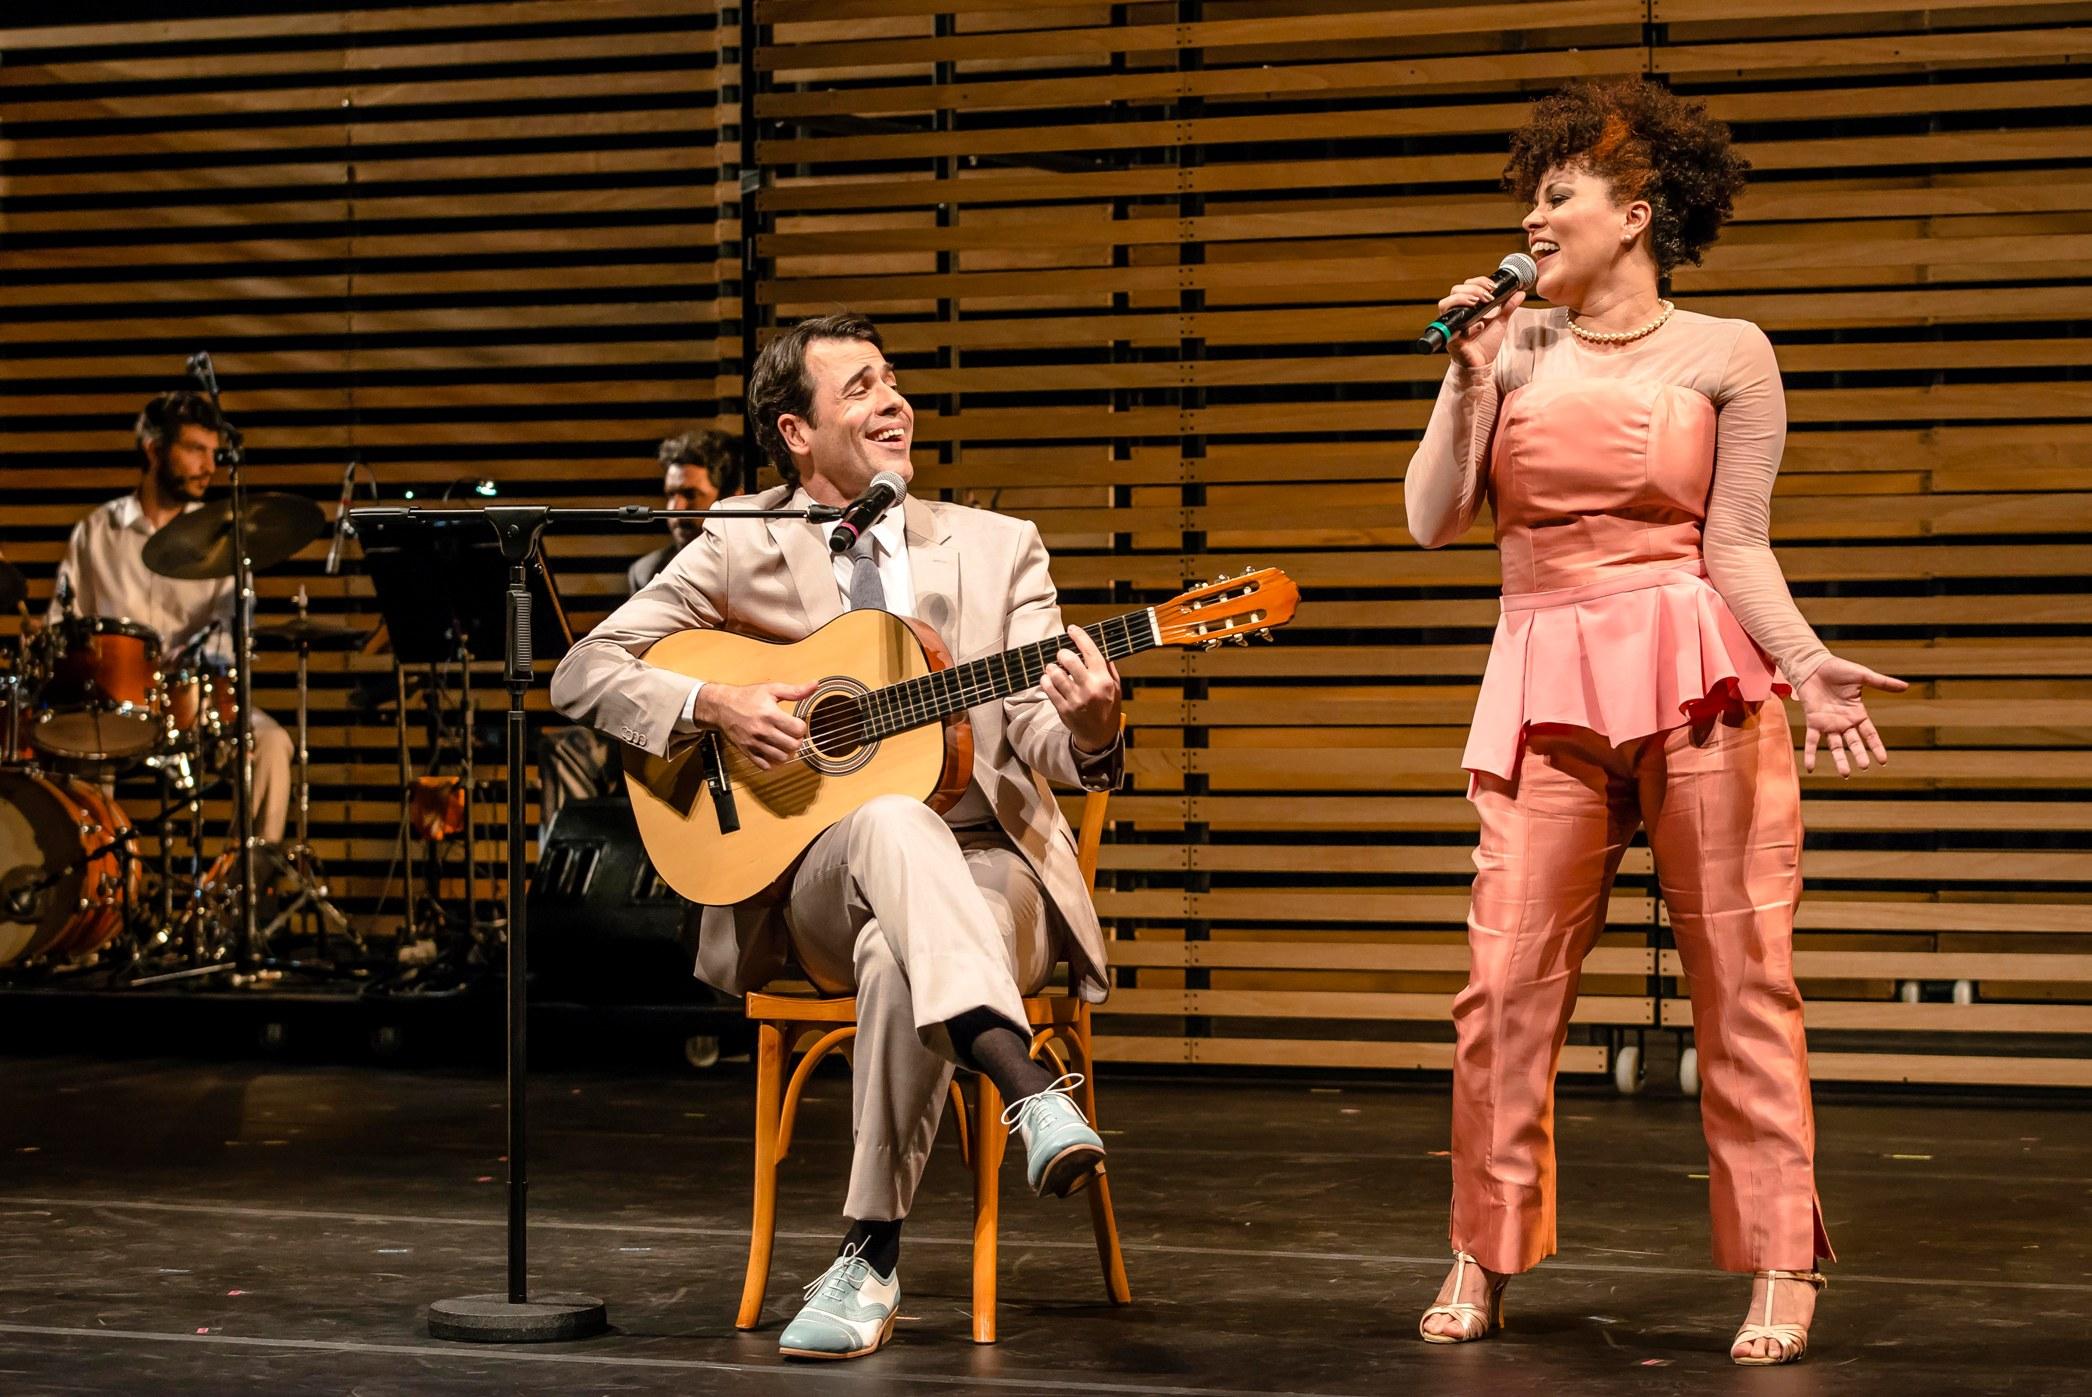 O-Musical-da-Bossa-Nova-05-Créd.-Caio-Gallucci